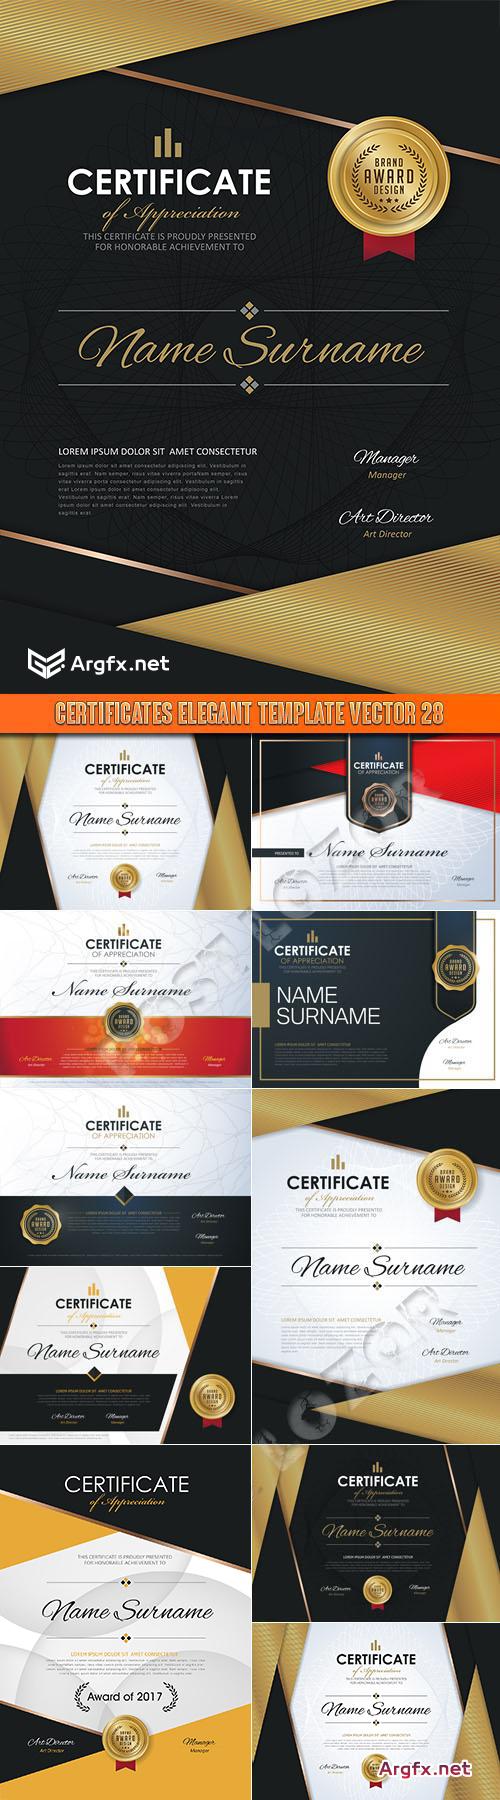 Certificates elegant template vector 28